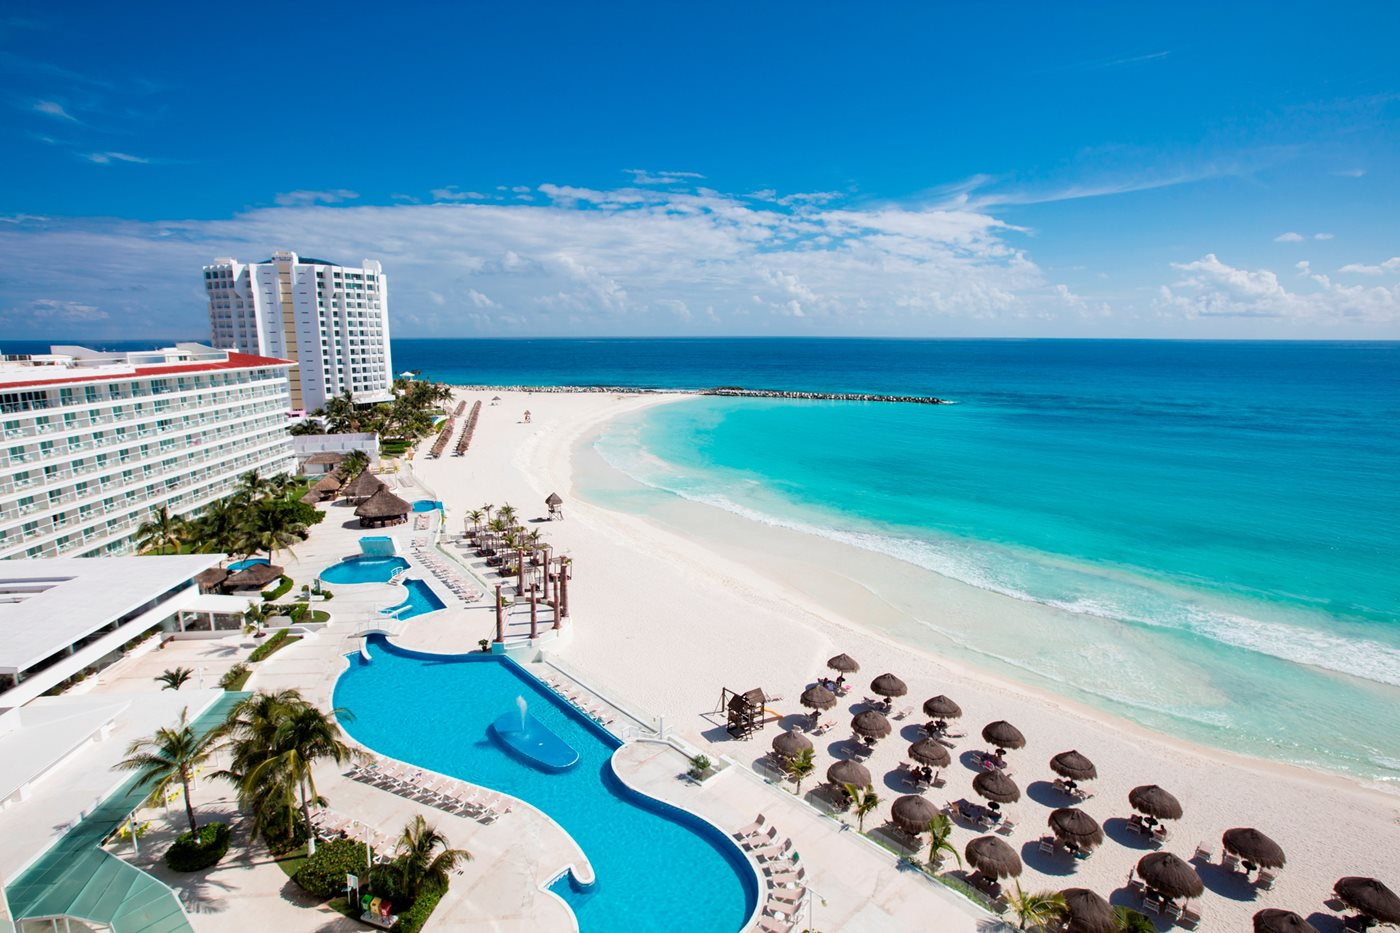 Krystal Cancun Cancun Transat